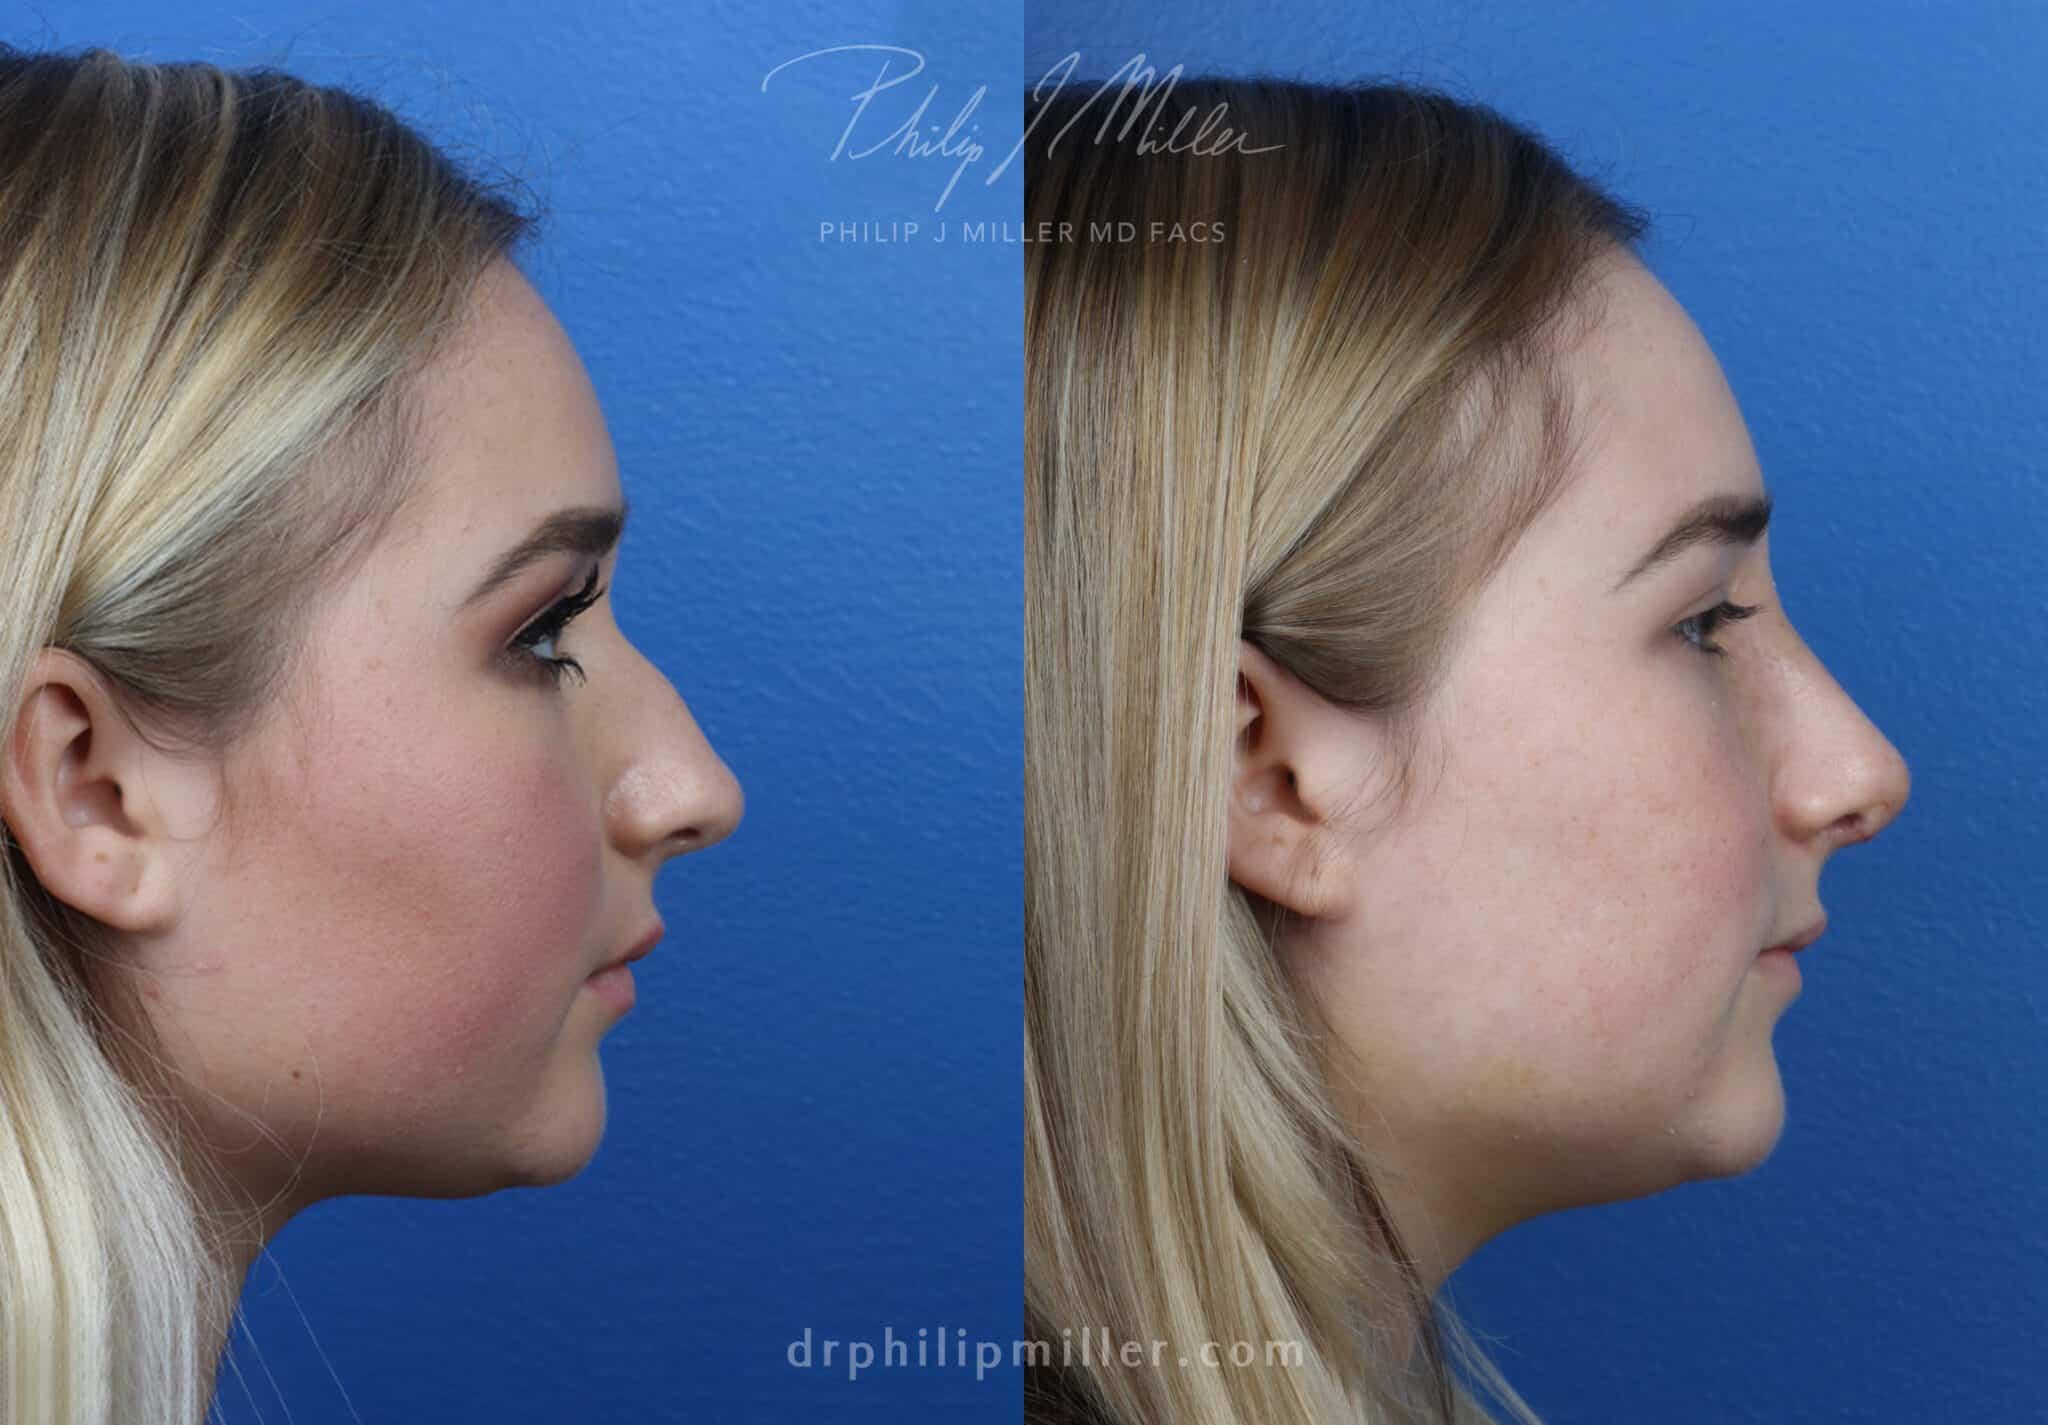 Rhinoplasty to adjust the nasal bridge by Dr. Miller